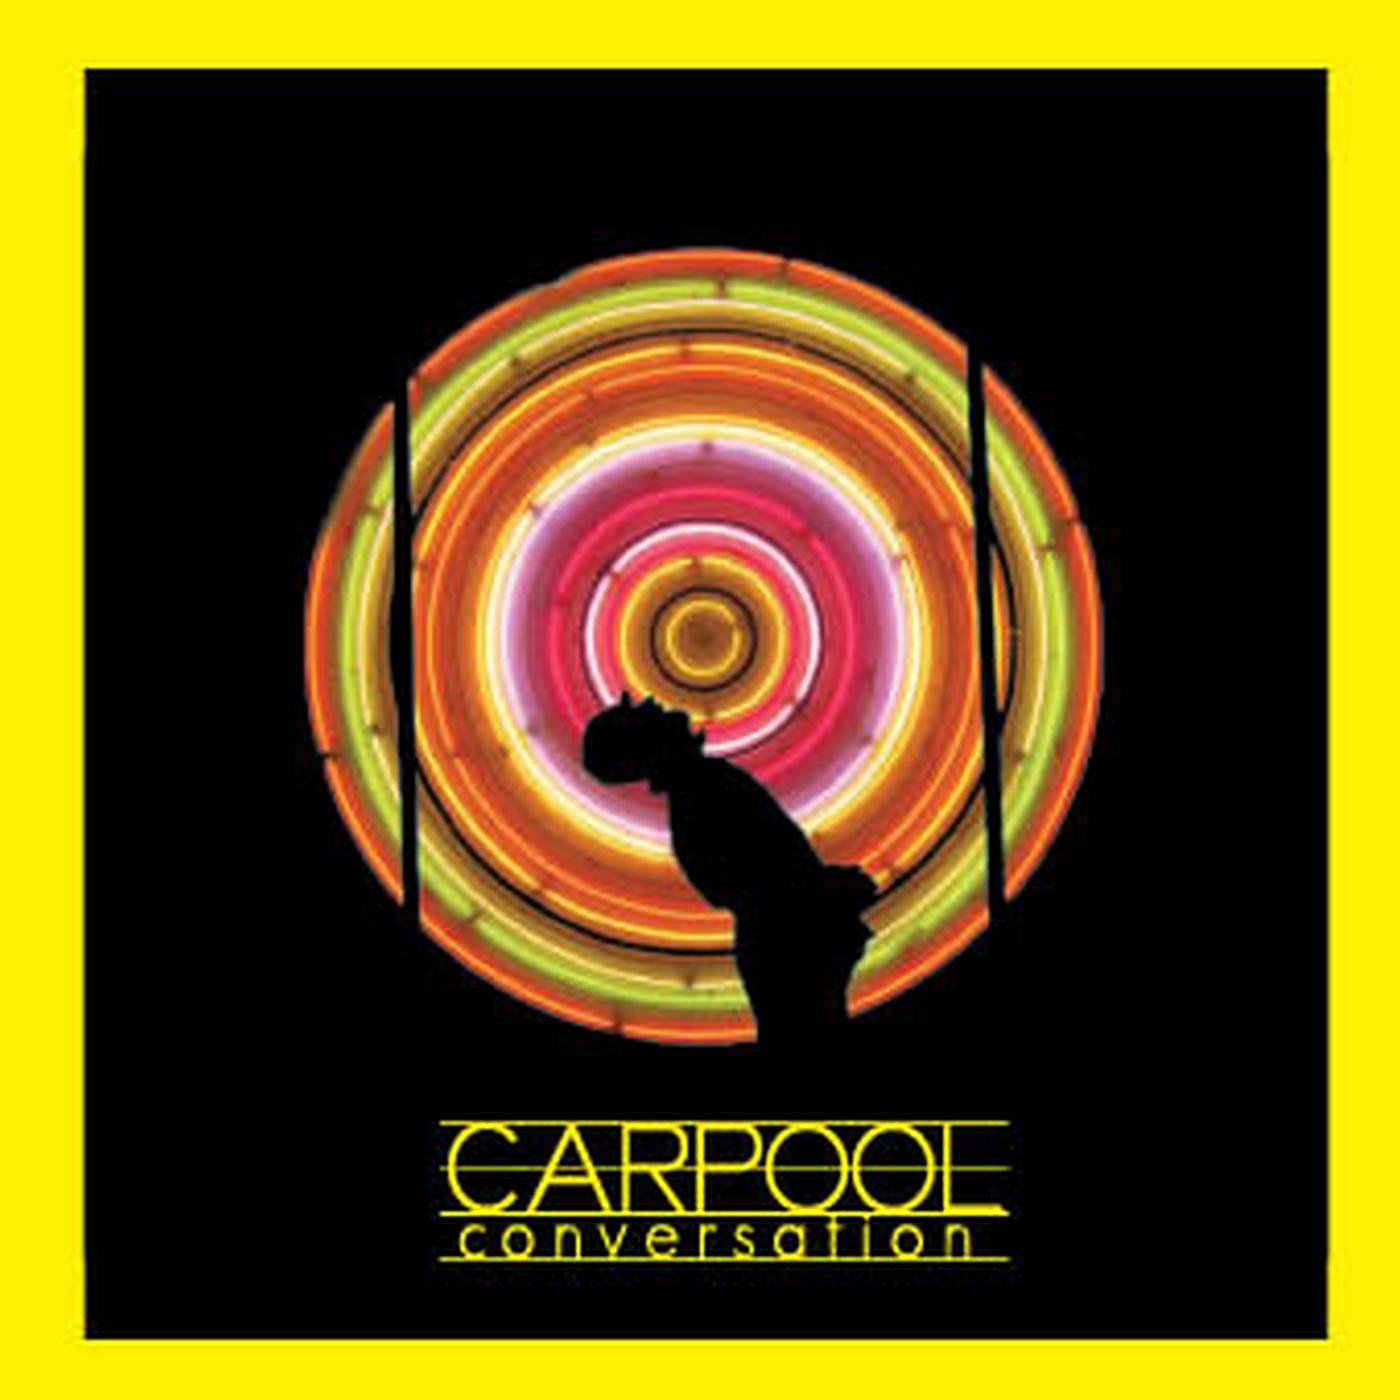 Free download - Carpool Conversation